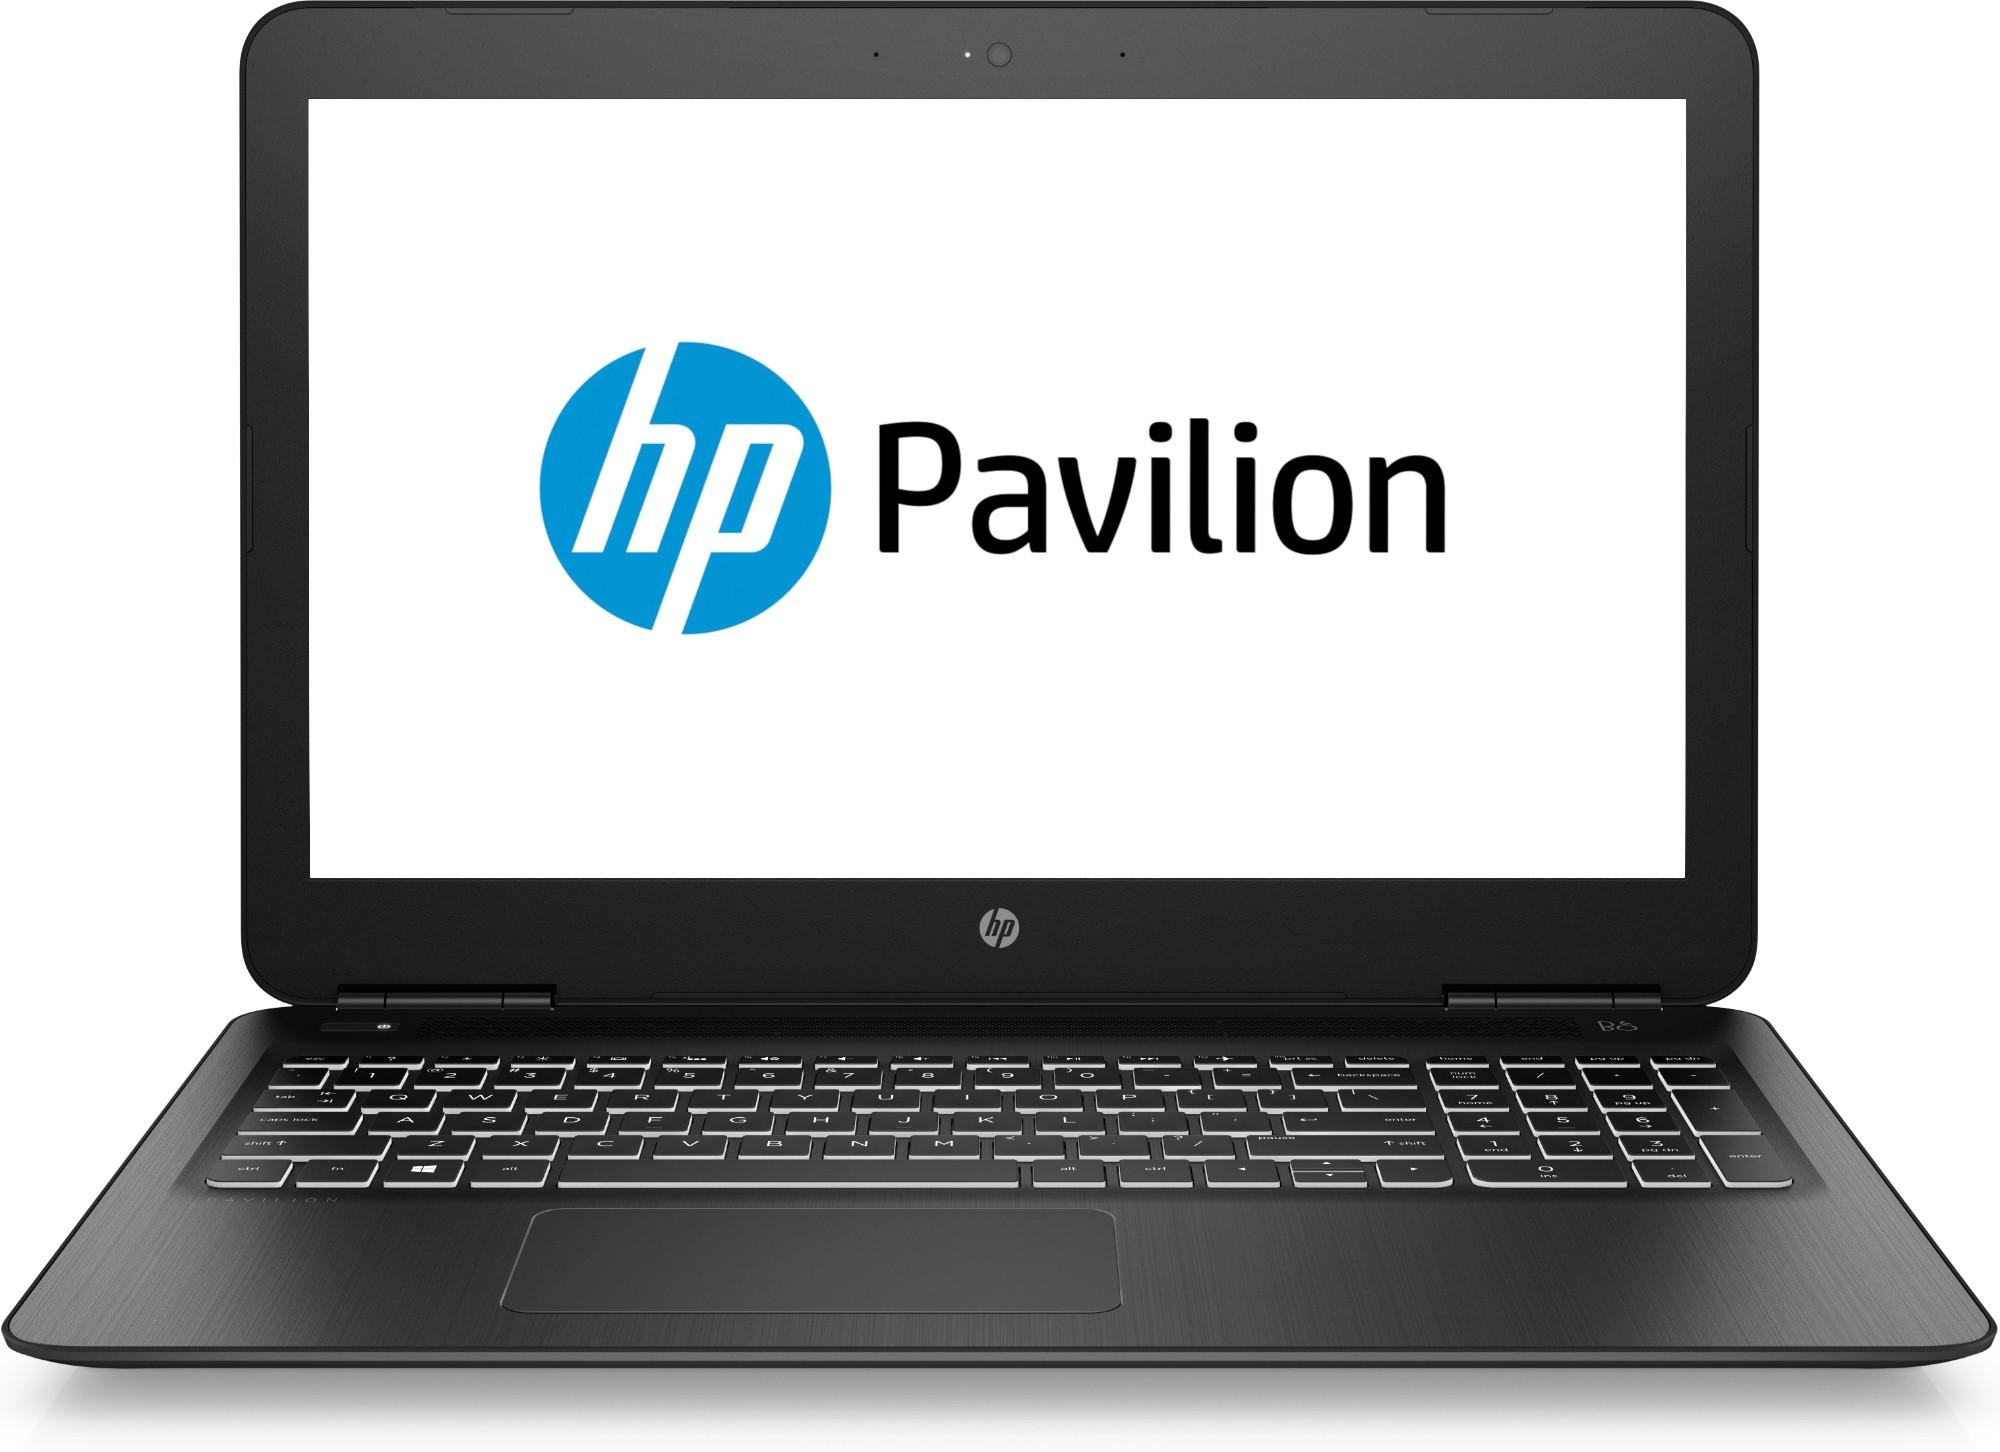 HP Pavilion 15-bc400na Black Notebook 39.6 cm (15.6